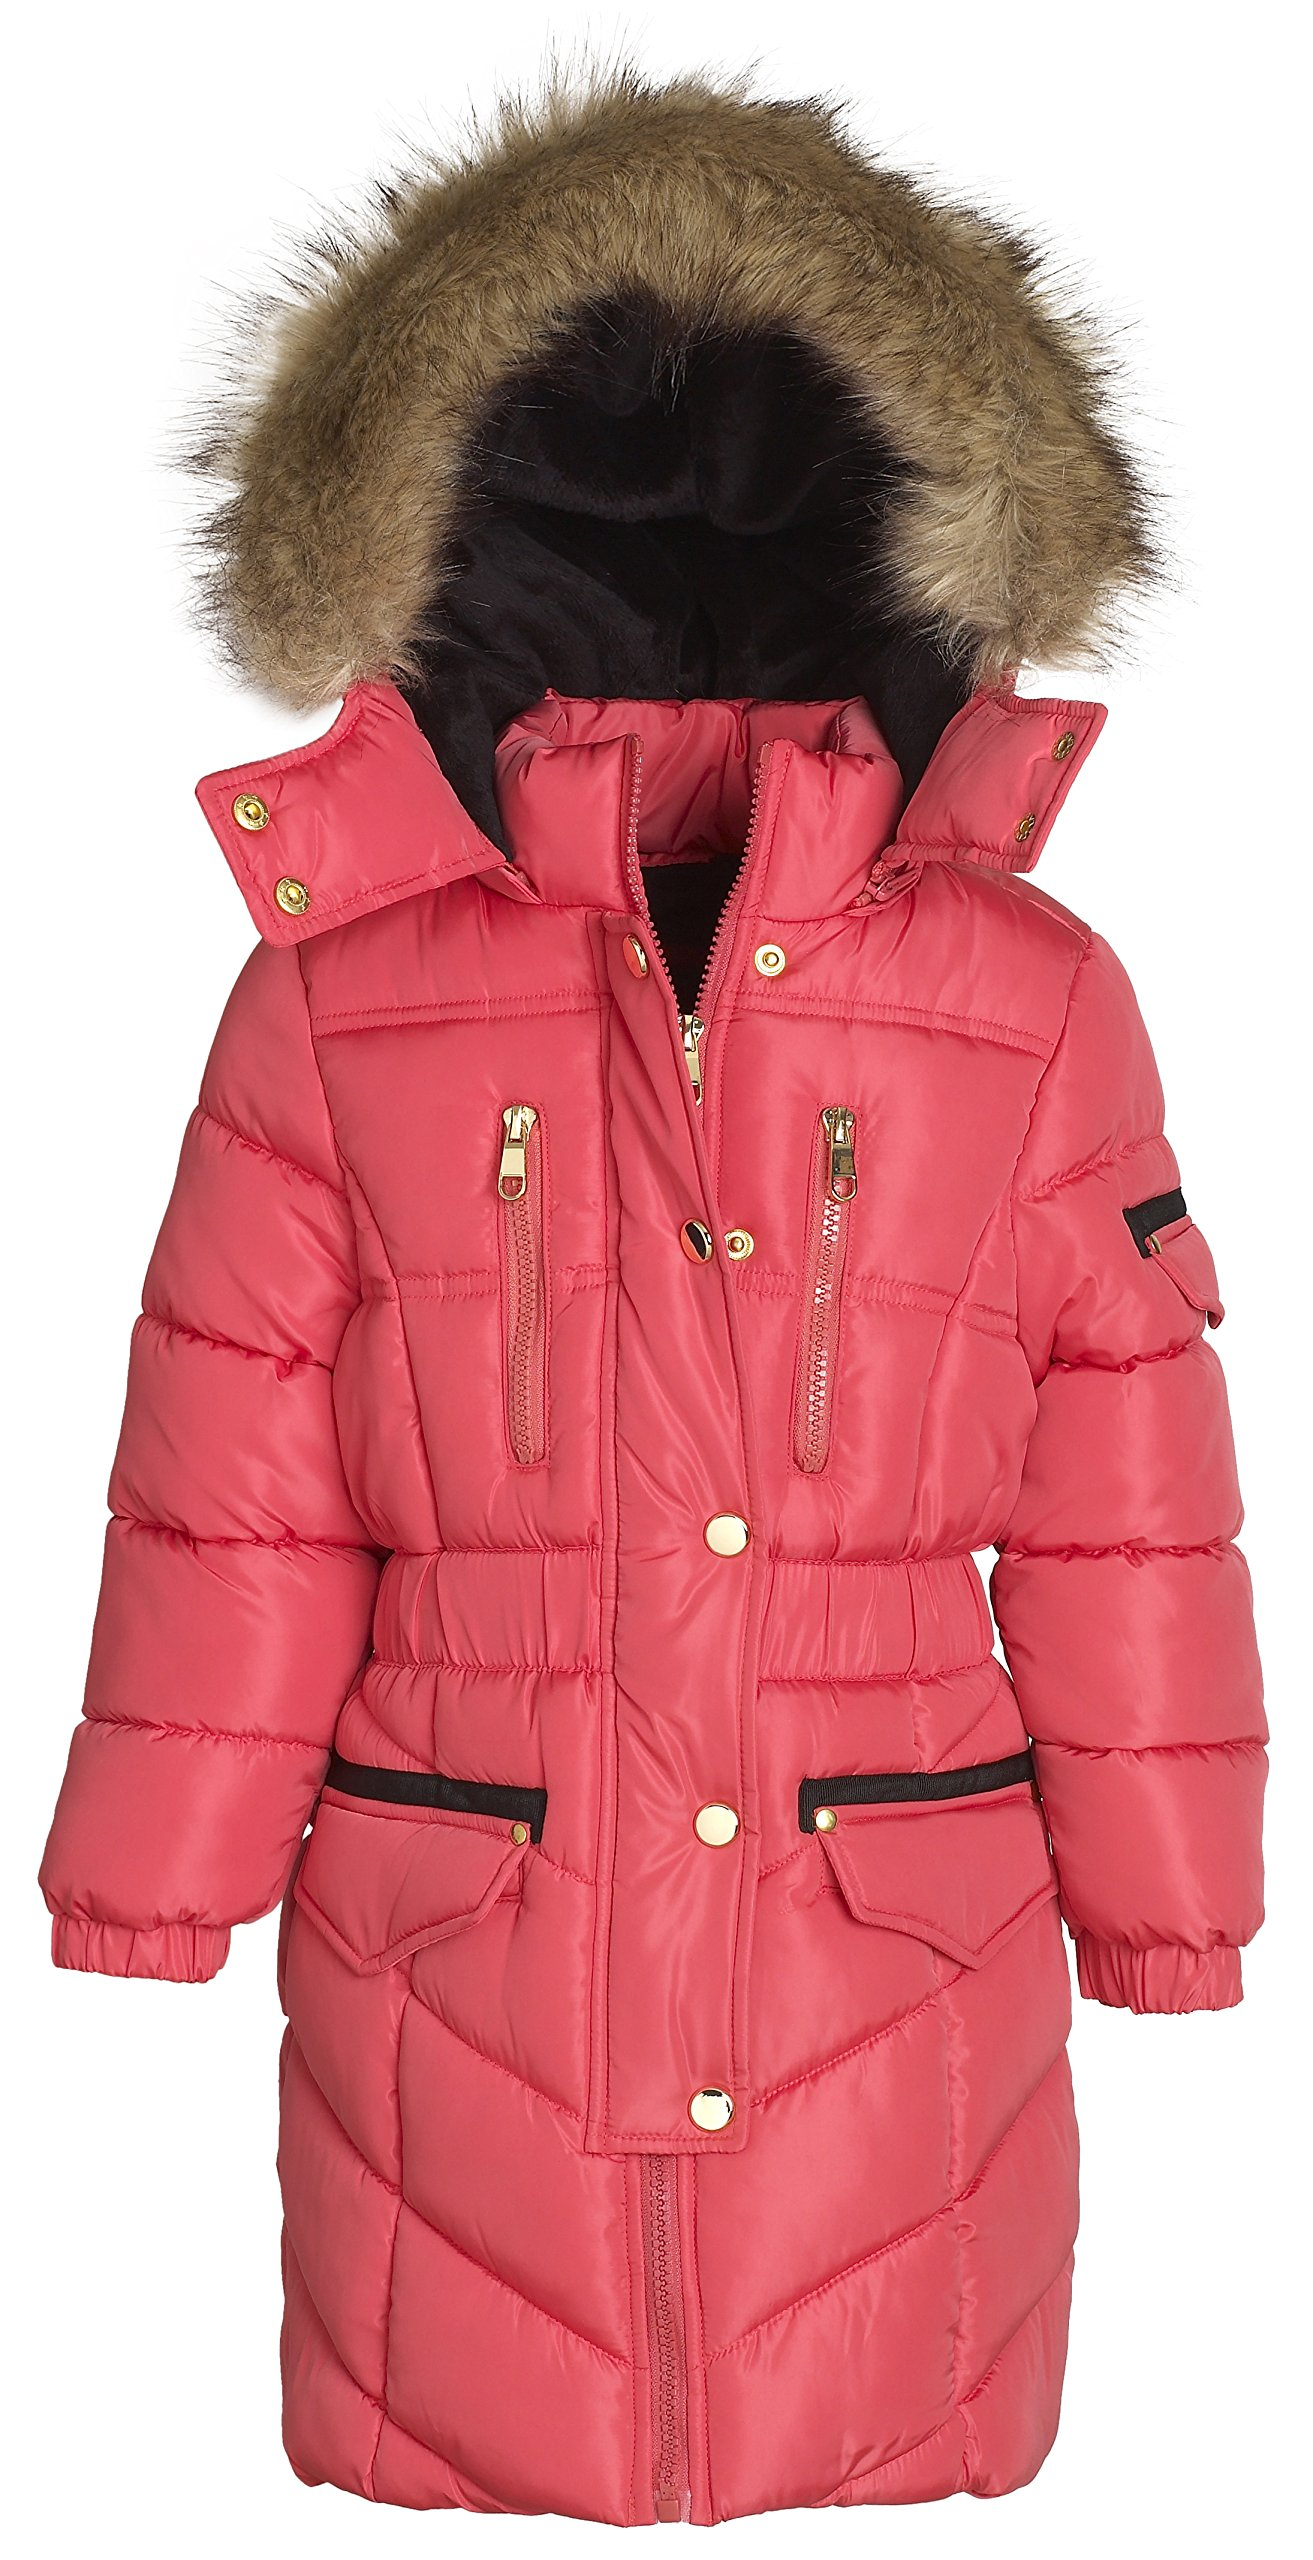 Sportoli Girls' Winter Heavy Quilt Padded Puffer Jacket Plush Lined Hooded Coat (Hibiscus, 7/8)